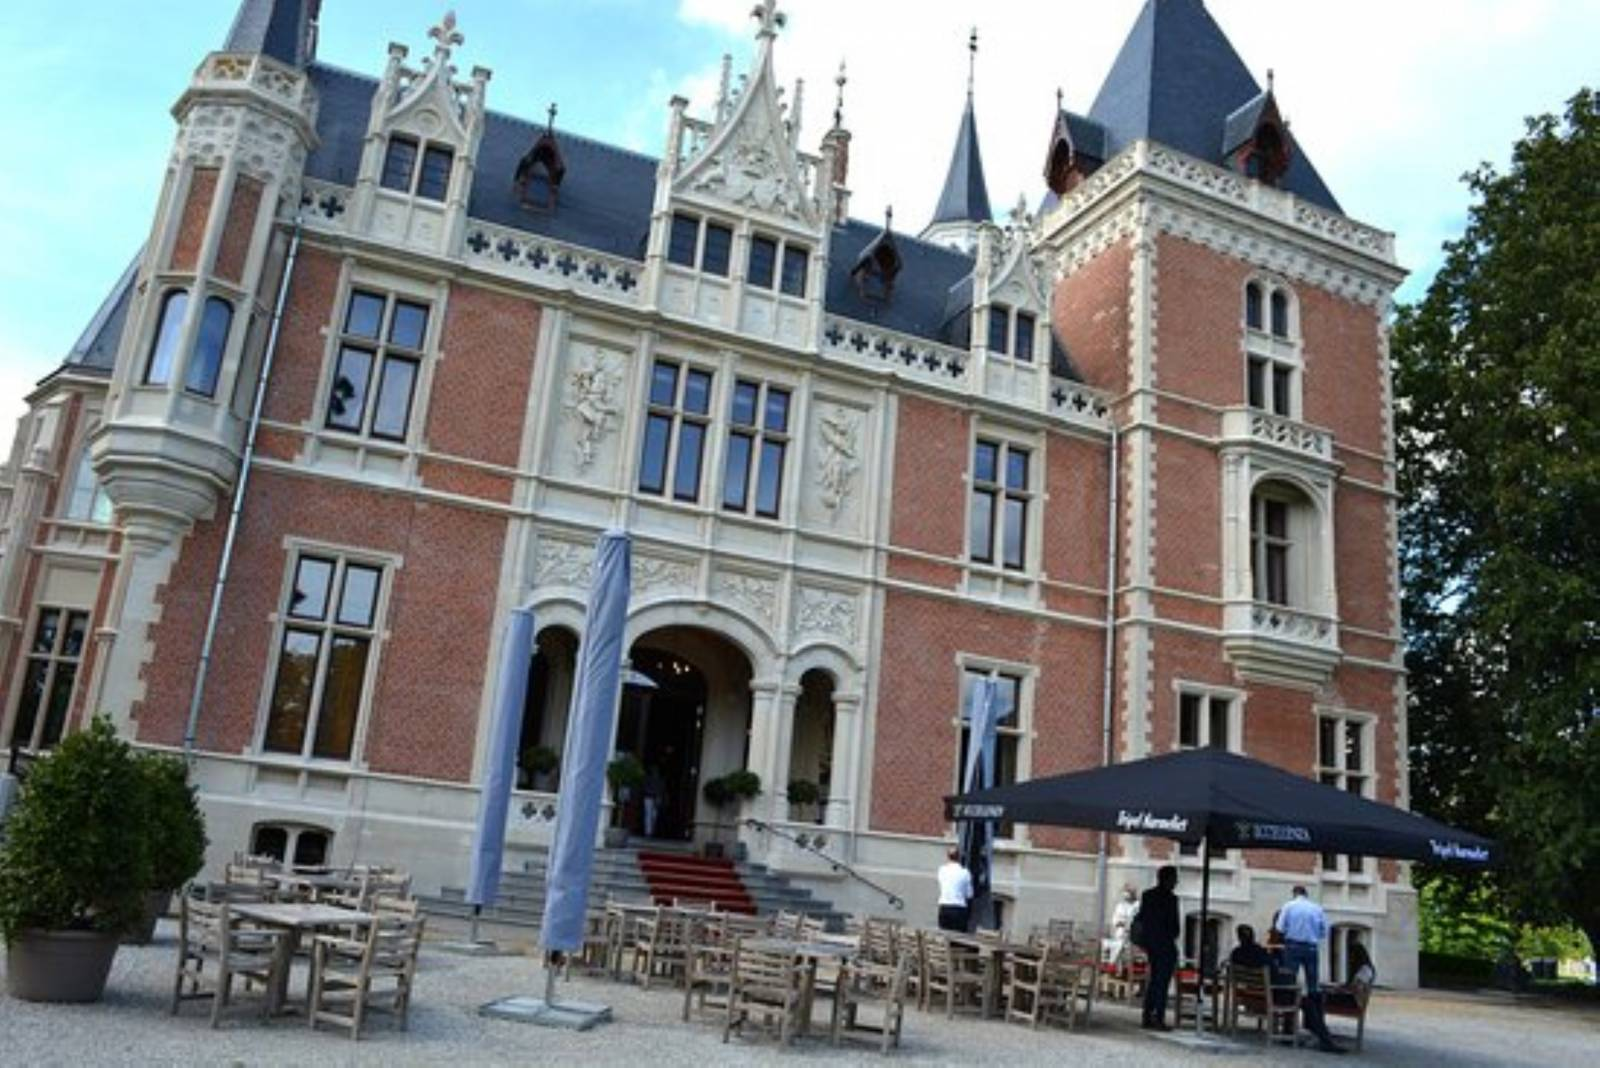 Kasteel D'artrycke - Feestzaal - House of Weddings (8)